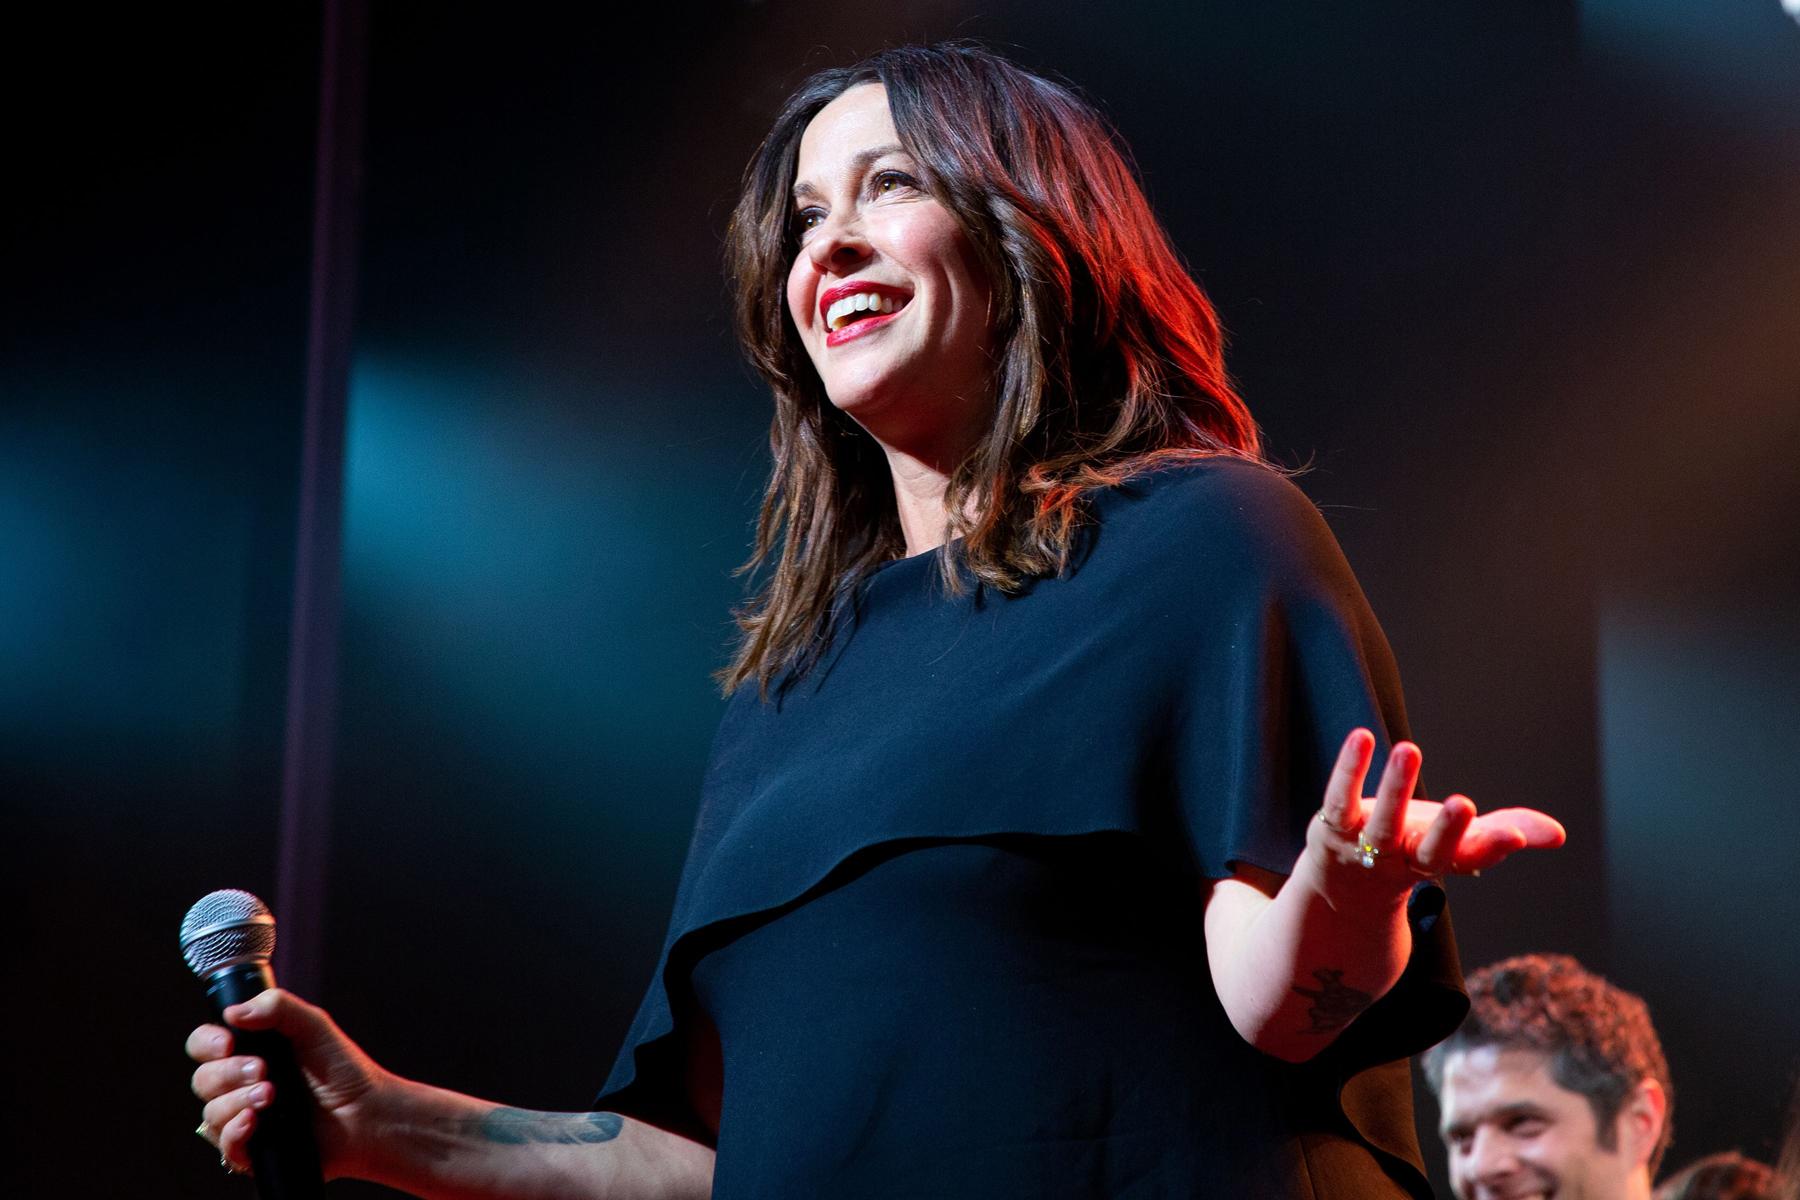 Alanis Morissette Is Hosting a 'Jagged Little Pill' Livestream Benefit - EpicNews